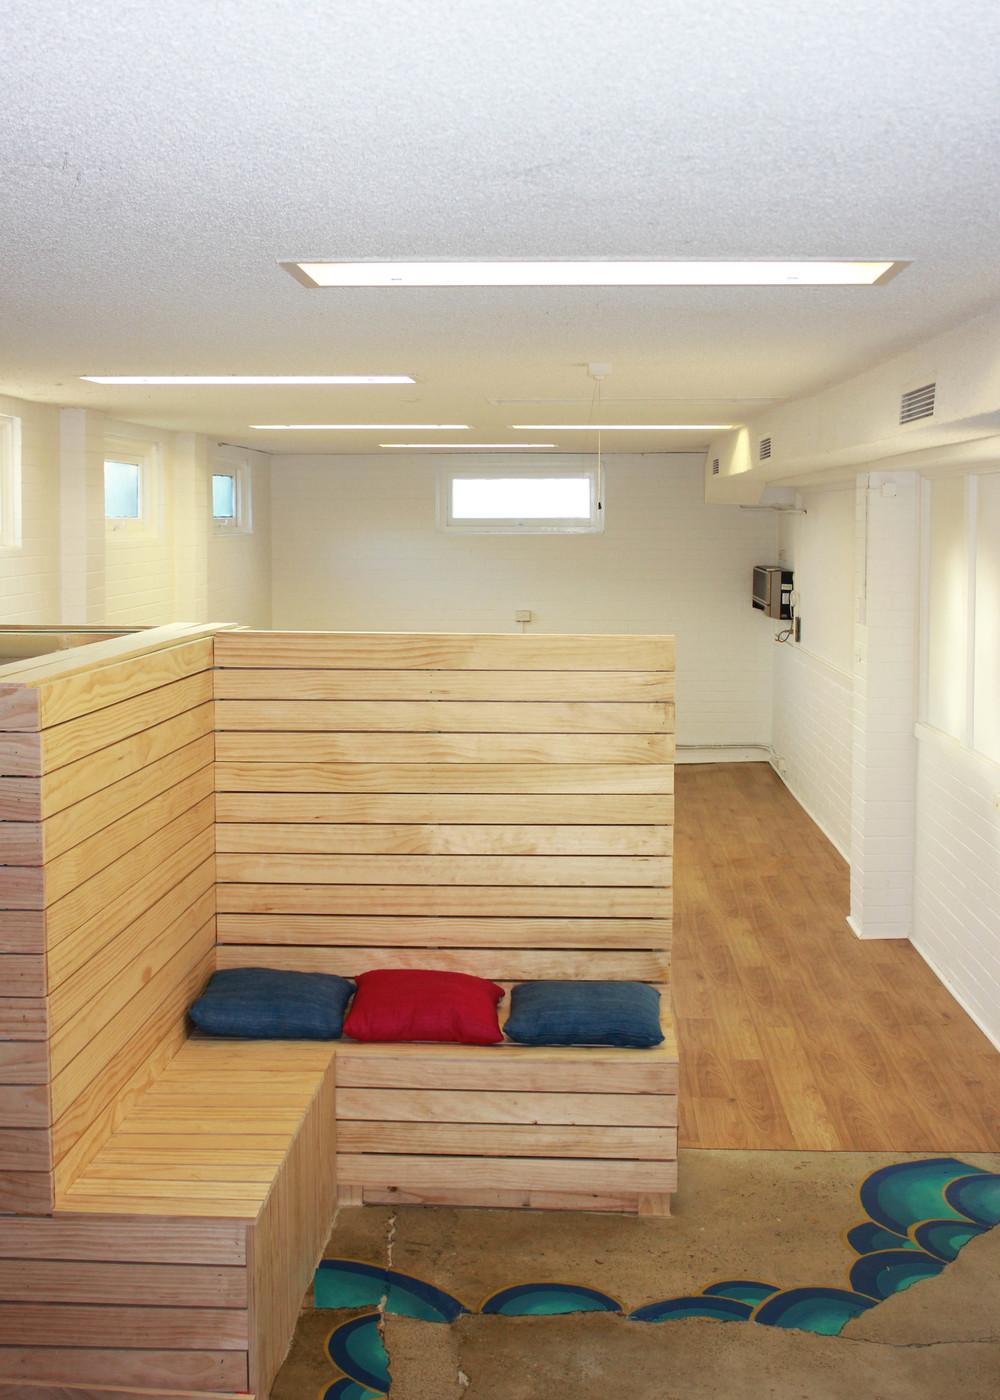 SILOpaddington _Spirit Room 001web.jpg